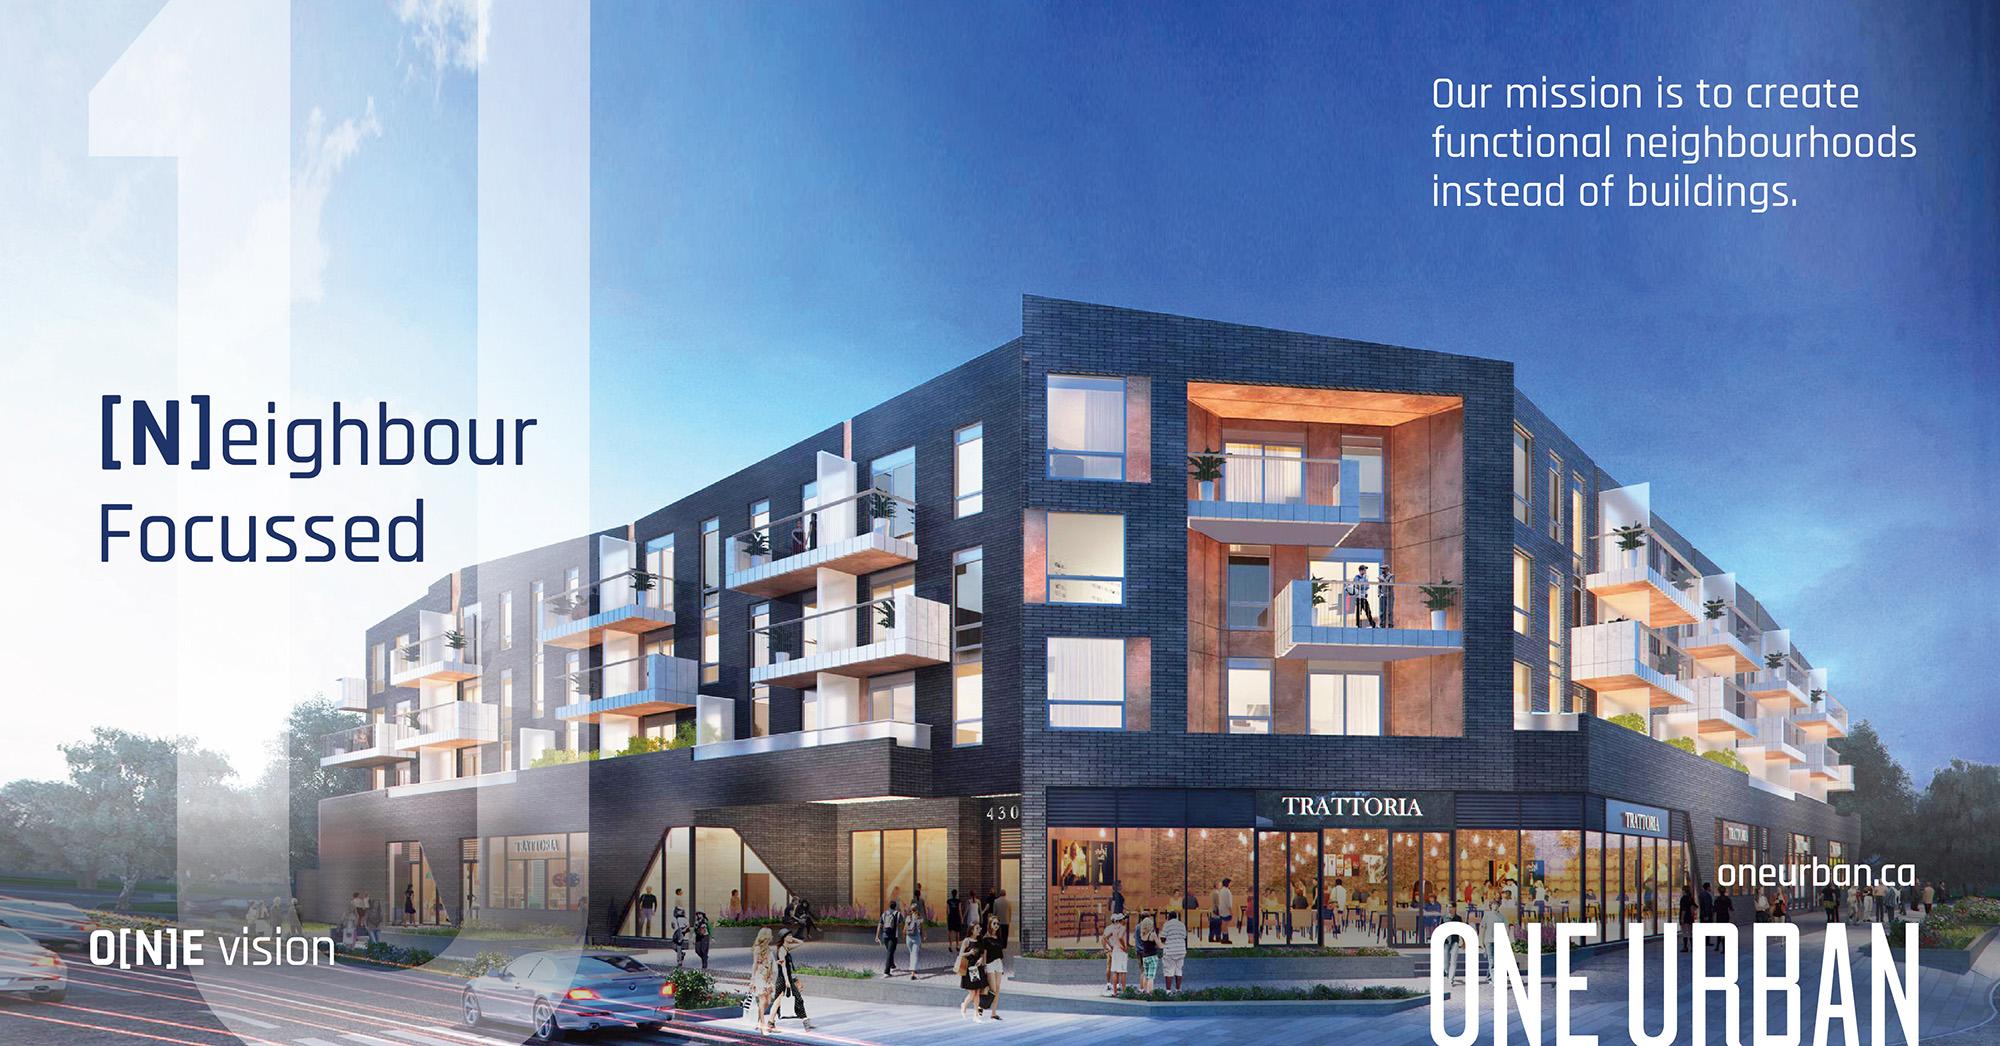 One-Urban-Neighbhour-Focussed.jpg